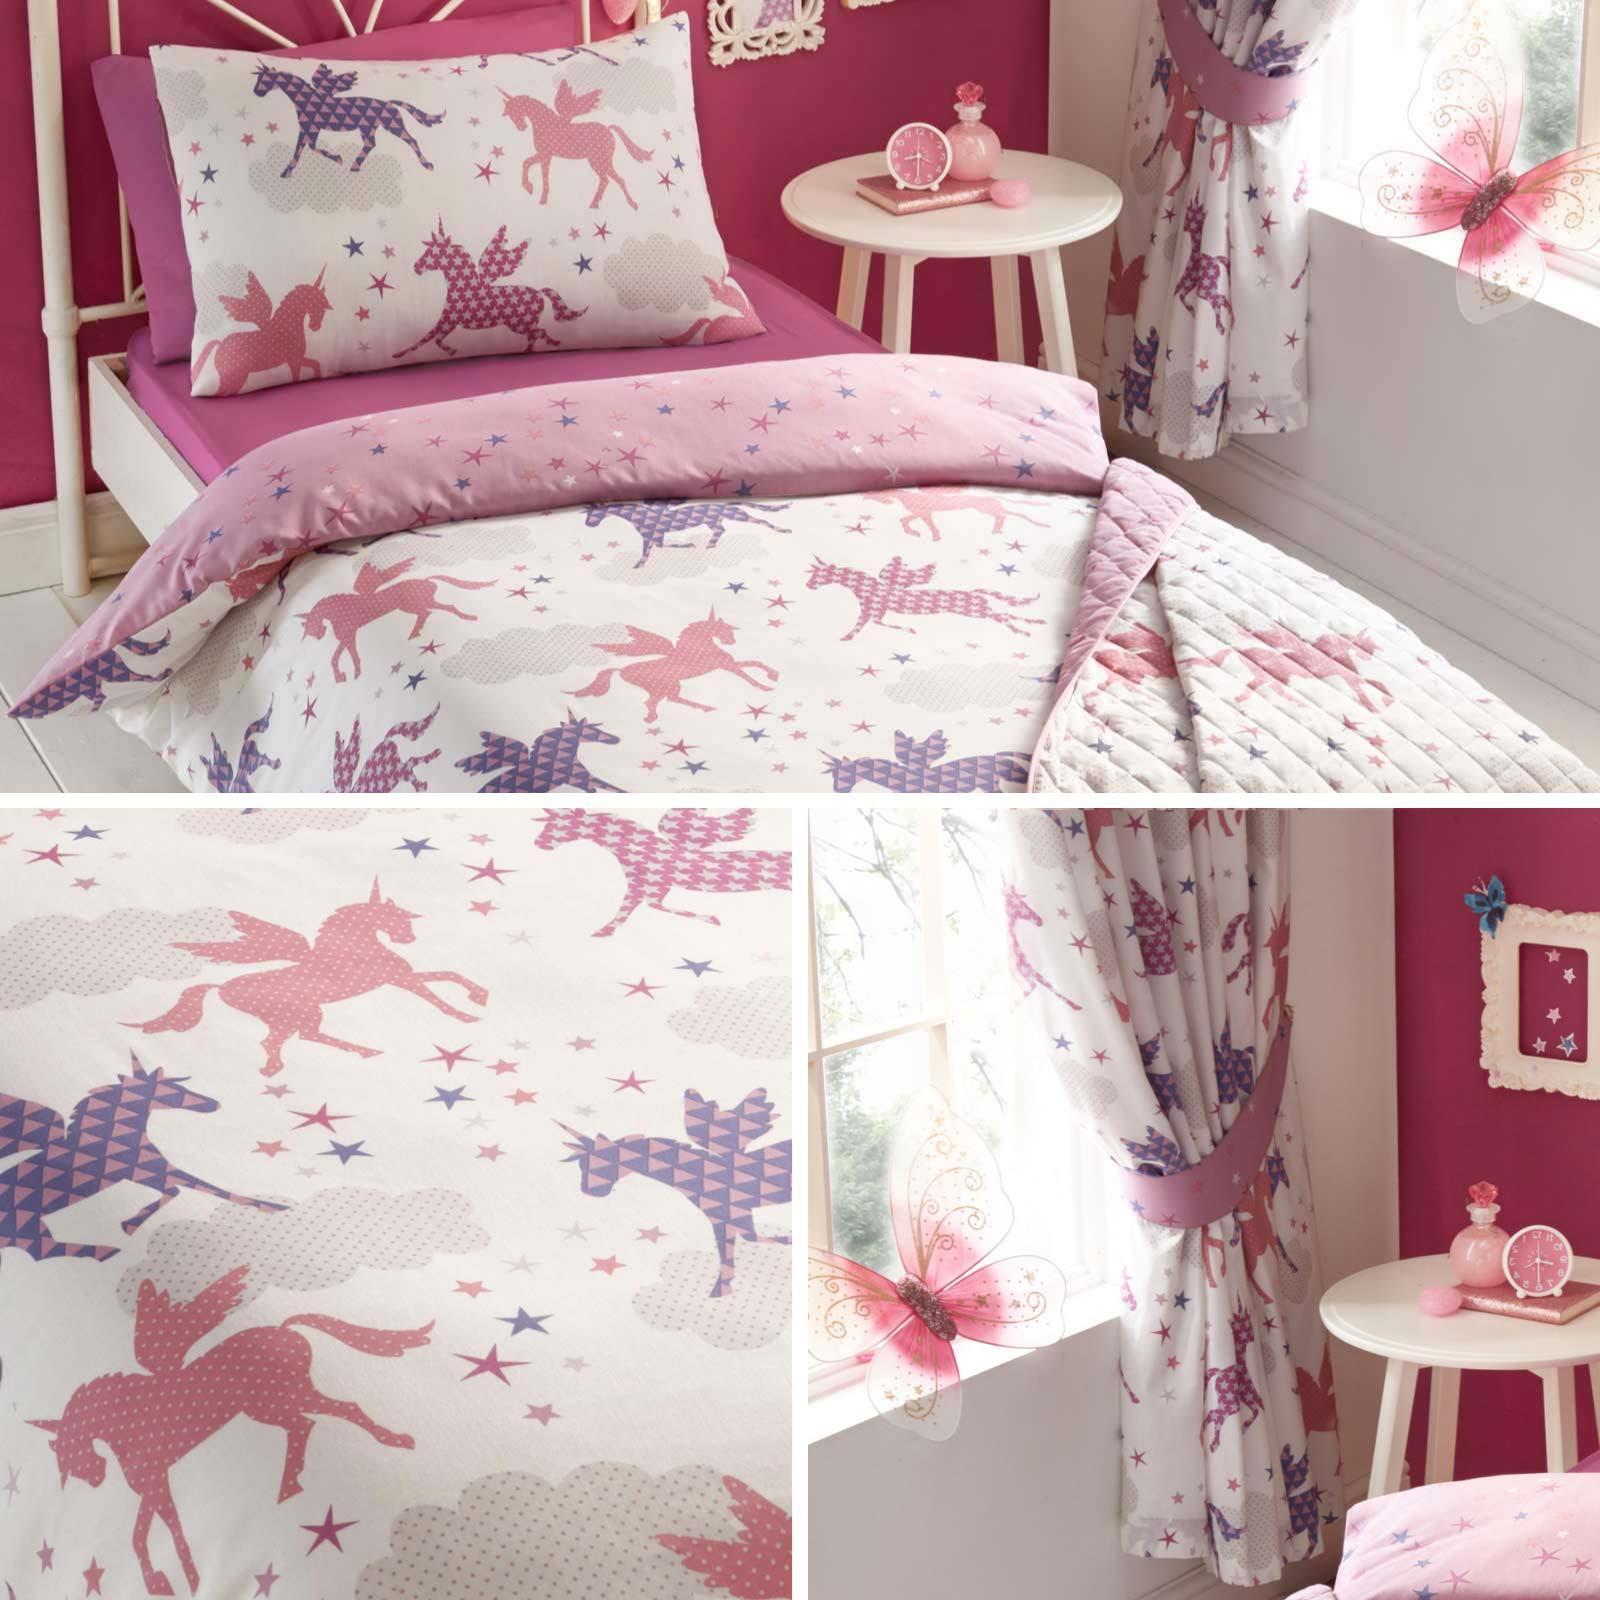 Pink Duvet Covers Divine Unicorns Star Print Girls Kids Quilt Cover Bedding Sets Ebay